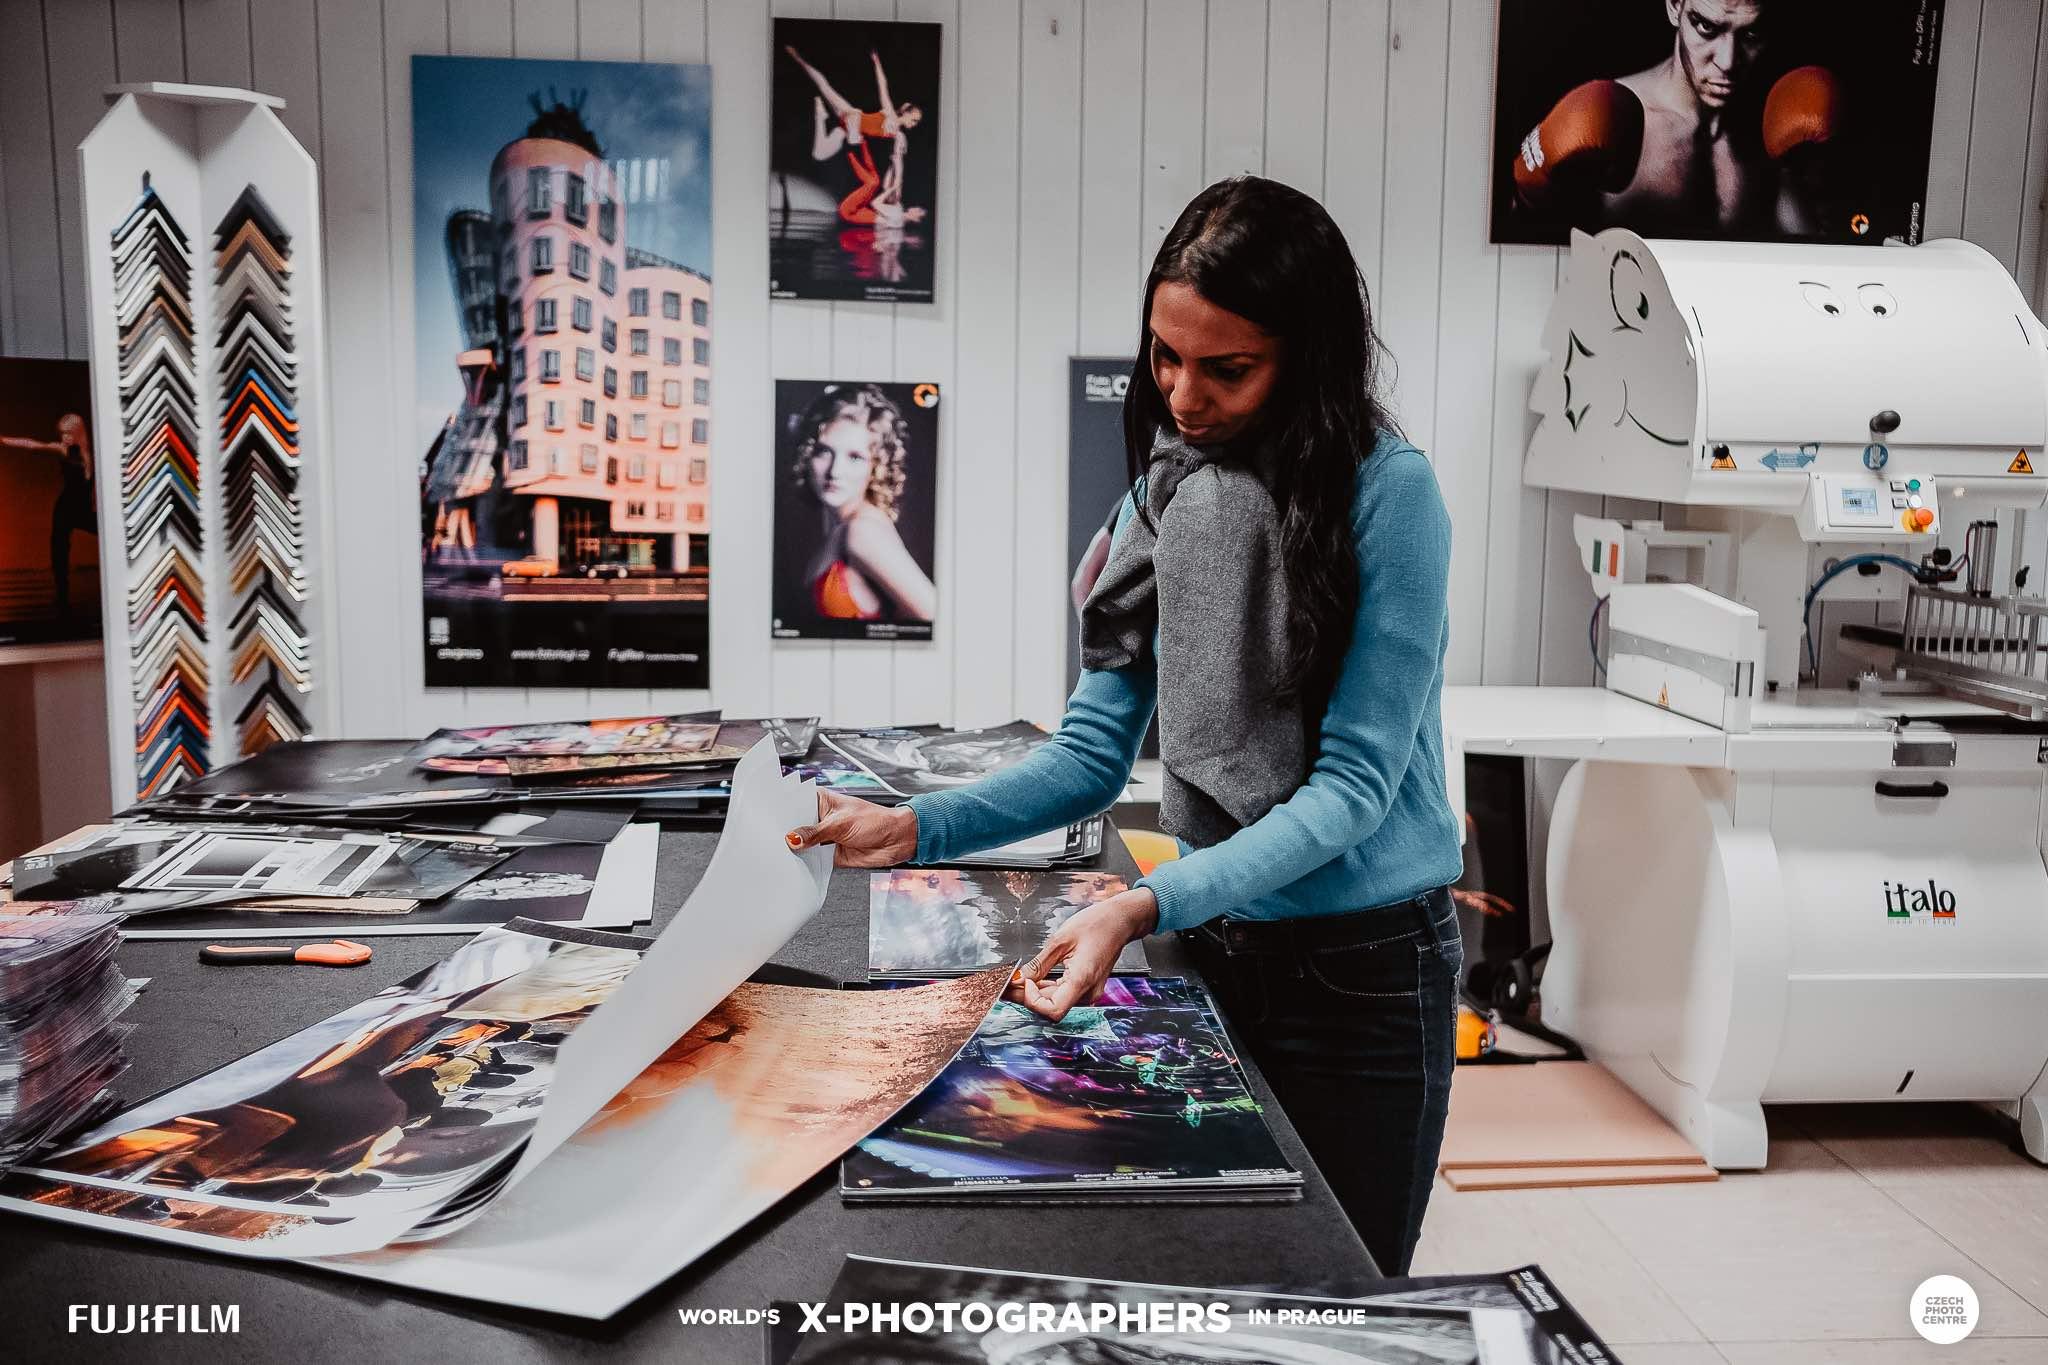 A Visit to Riegl Photolaboratory in Prague, CZ – Printing FUJIFILM Paper